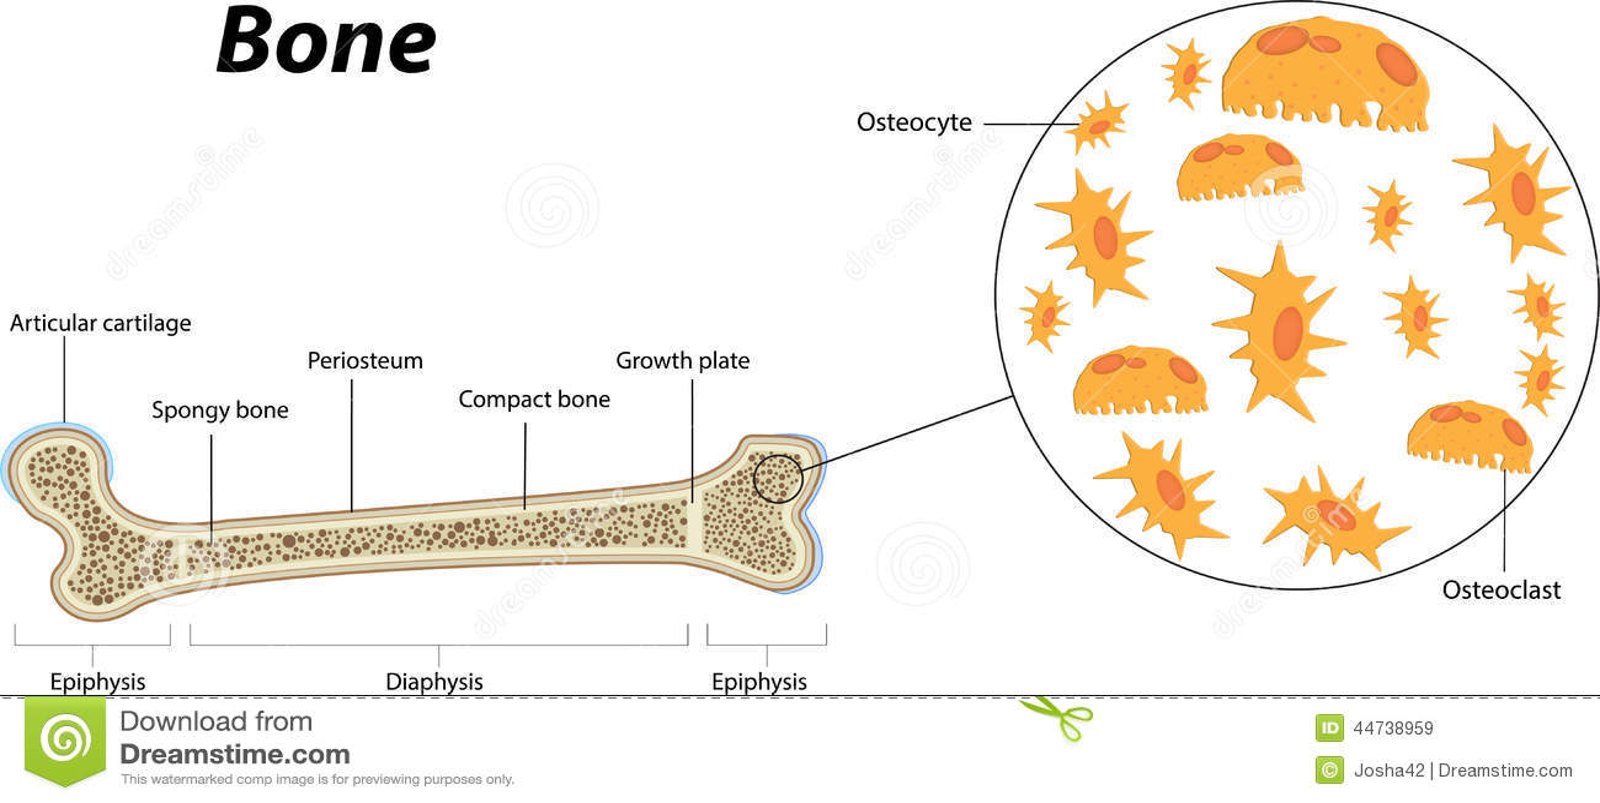 Bone Biology And Anatomy Stock Vector Illustration Of Spongy 44738959